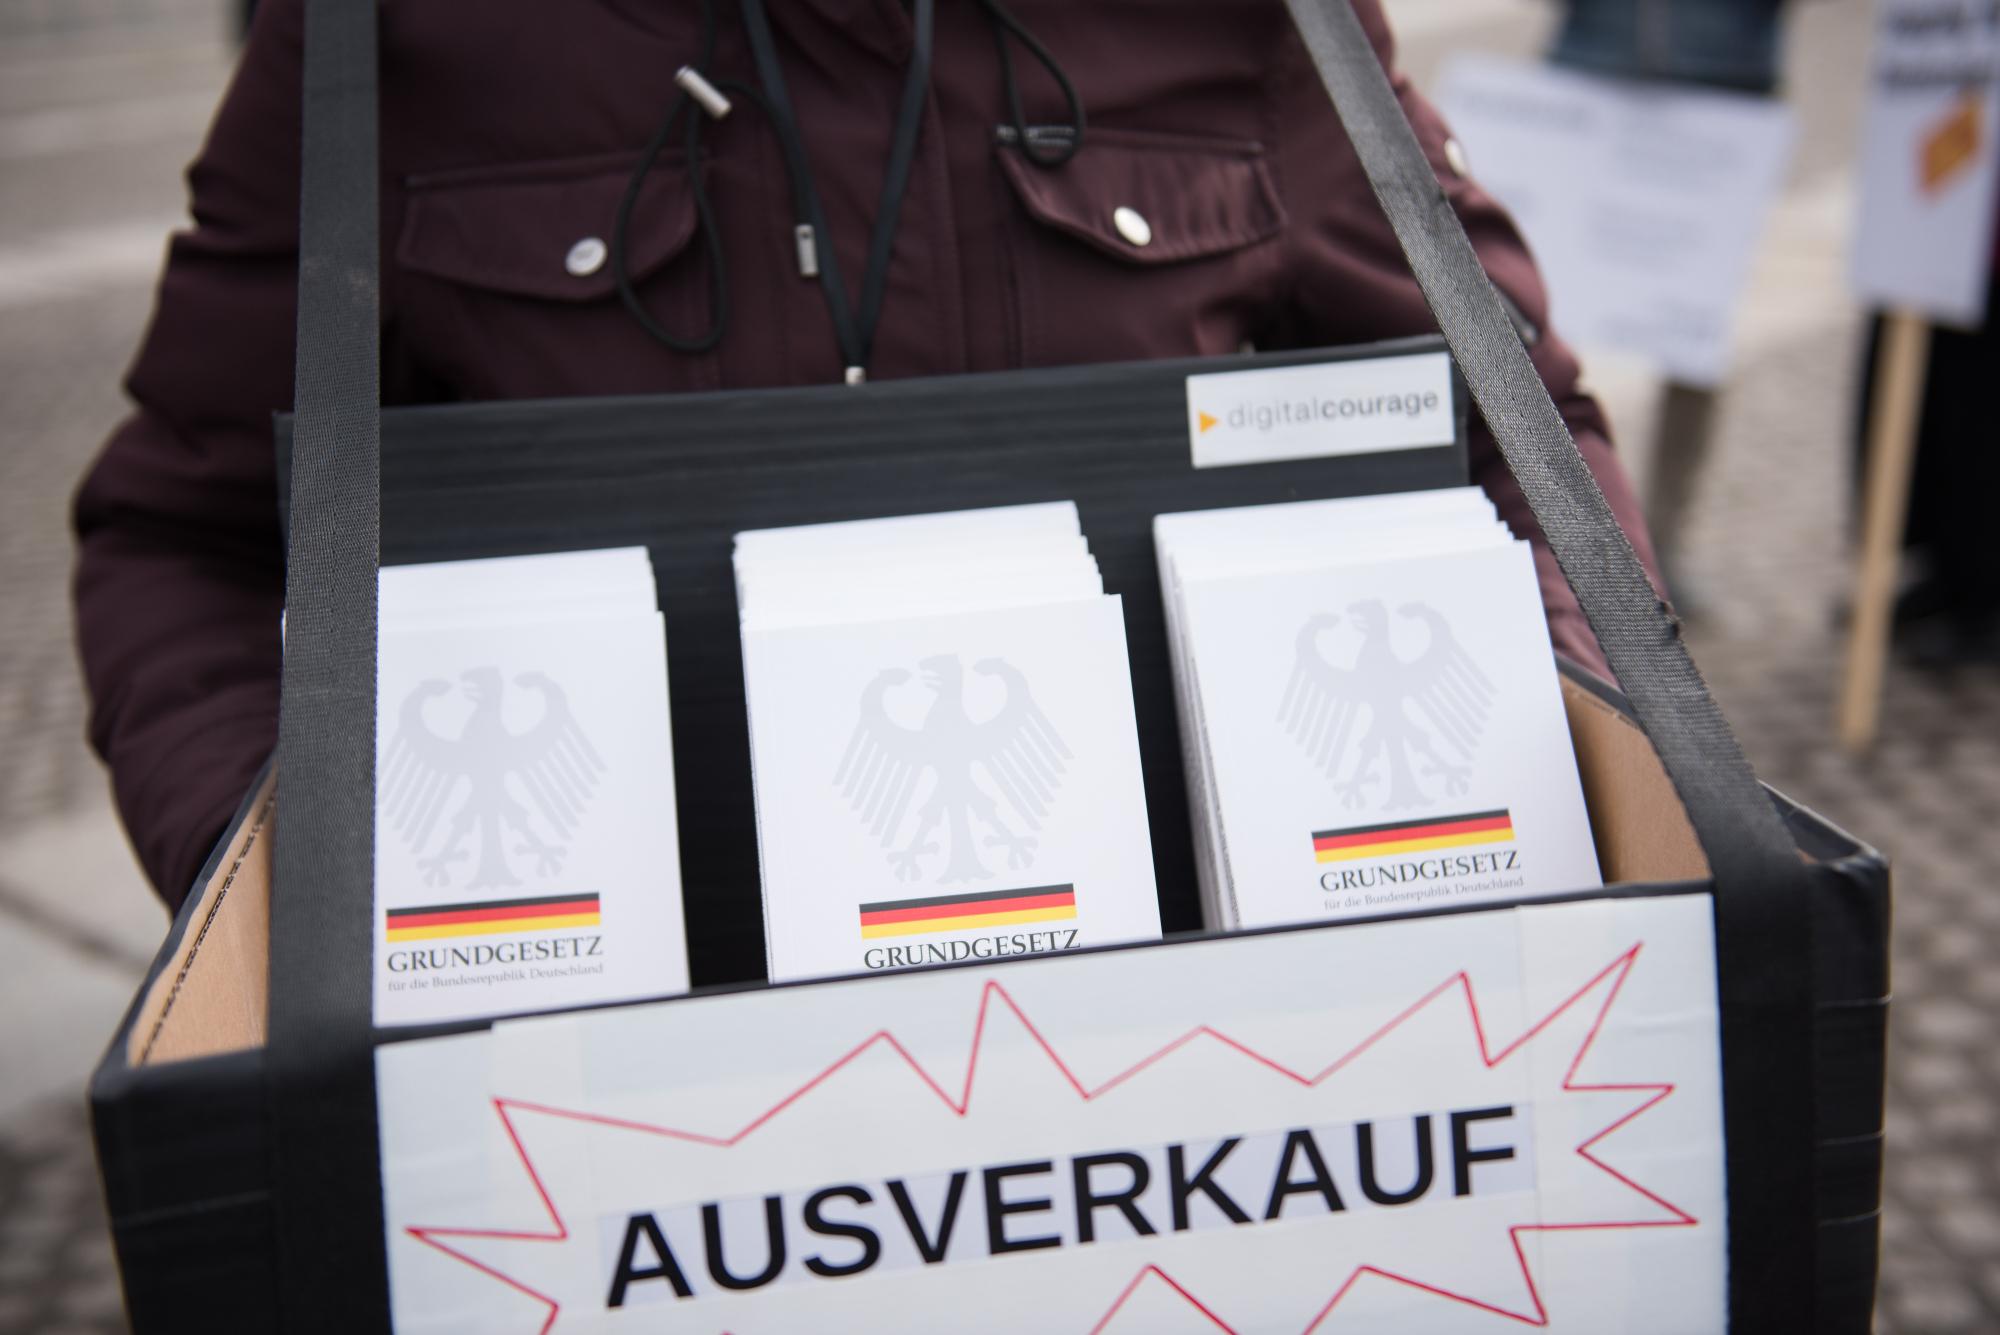 Gegen den #Ausverkauf der Grundrechte!